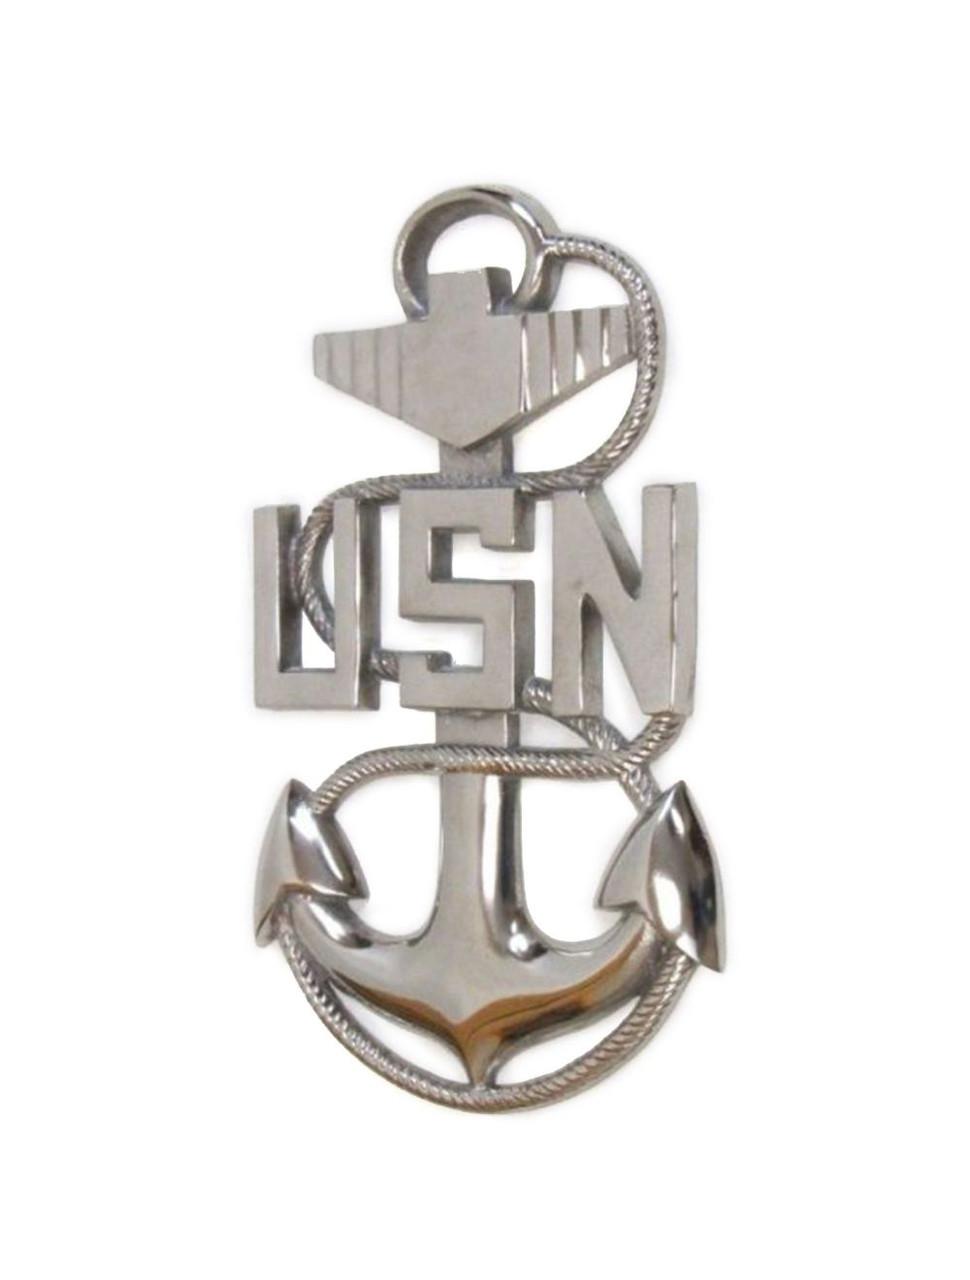 USN Navy Military E7 Fouled Anchor Emblem